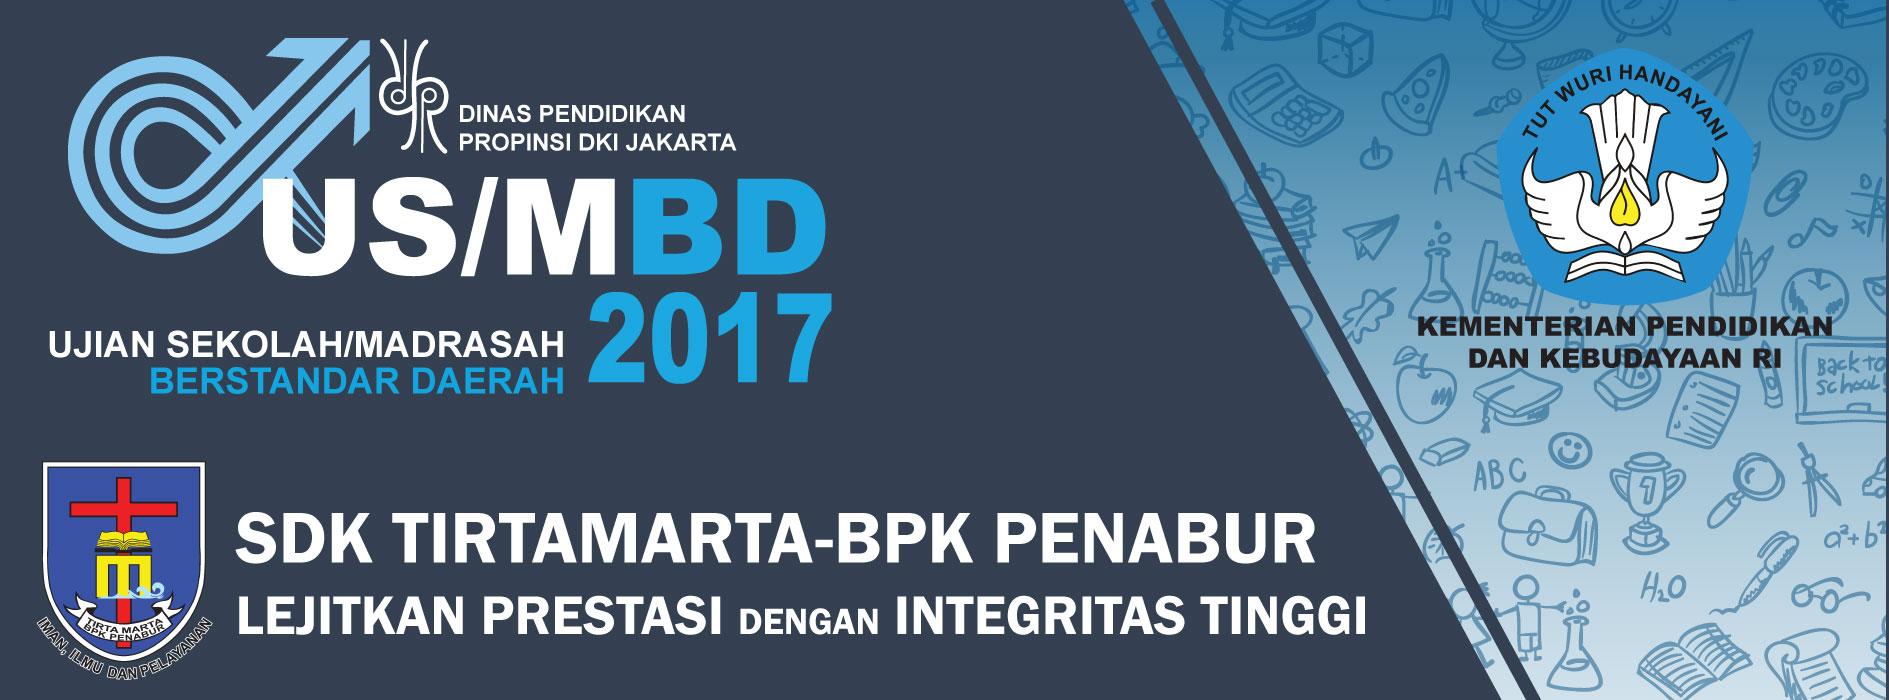 web-banner-usmbd-sd-tm-2017